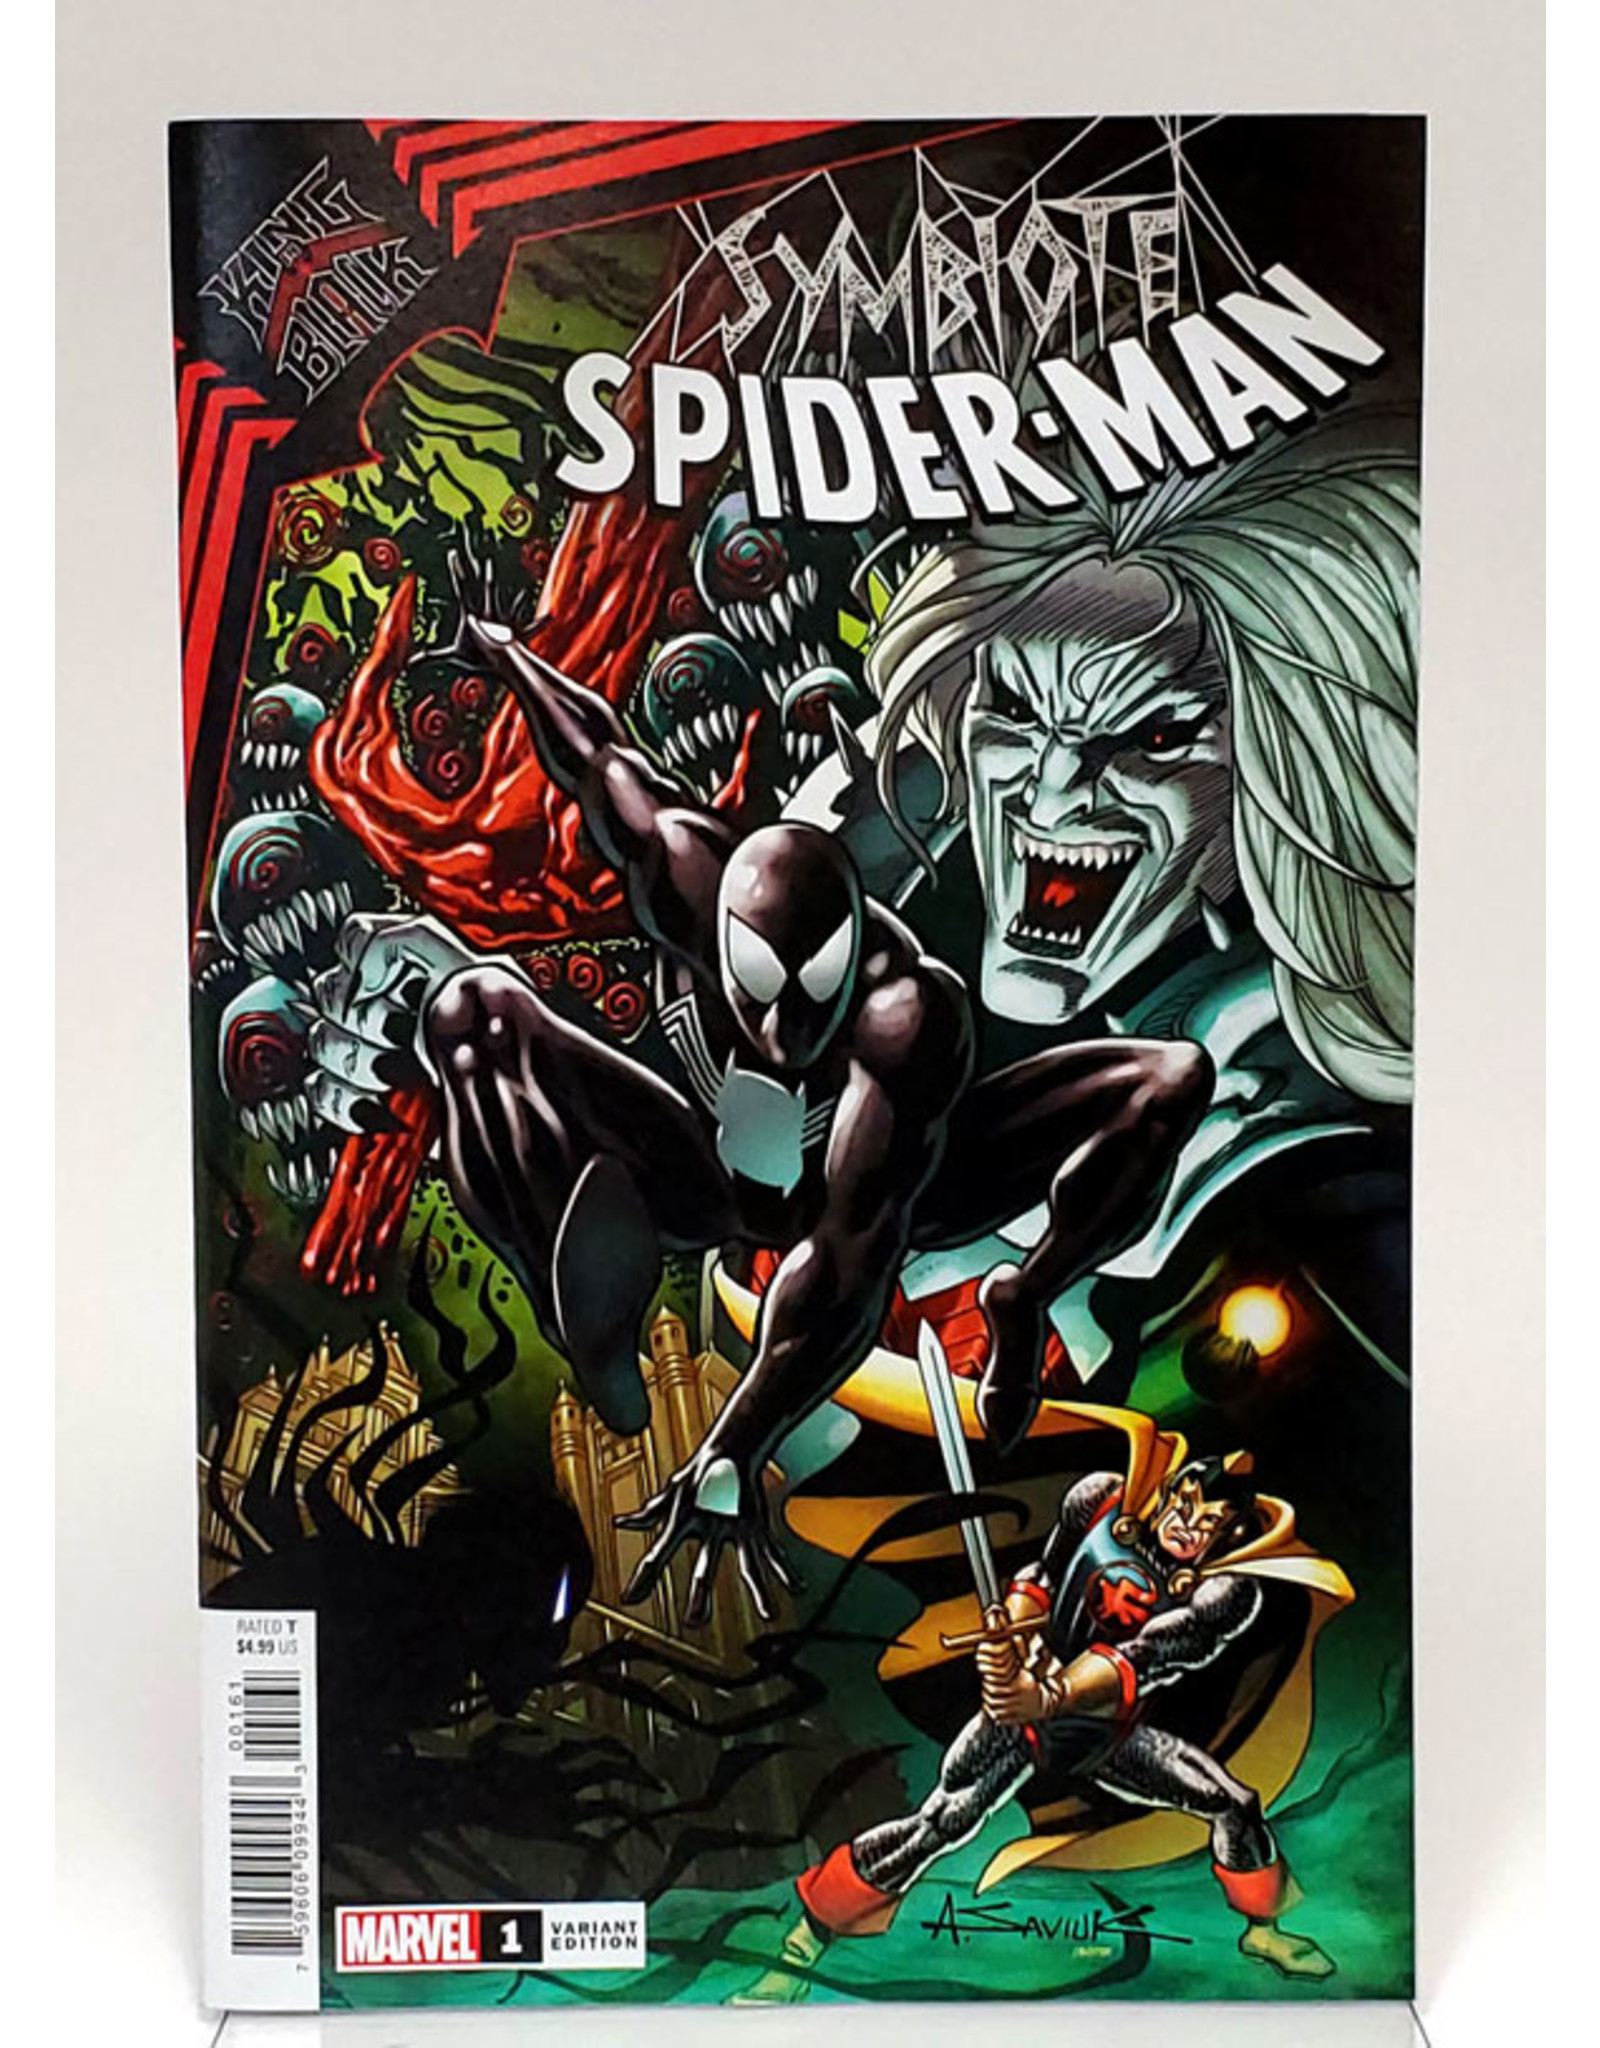 MARVEL COMICS SYMBIOTE SPIDER-MAN KING IN BLACK #1 1:25 SAVIUK VARIANT